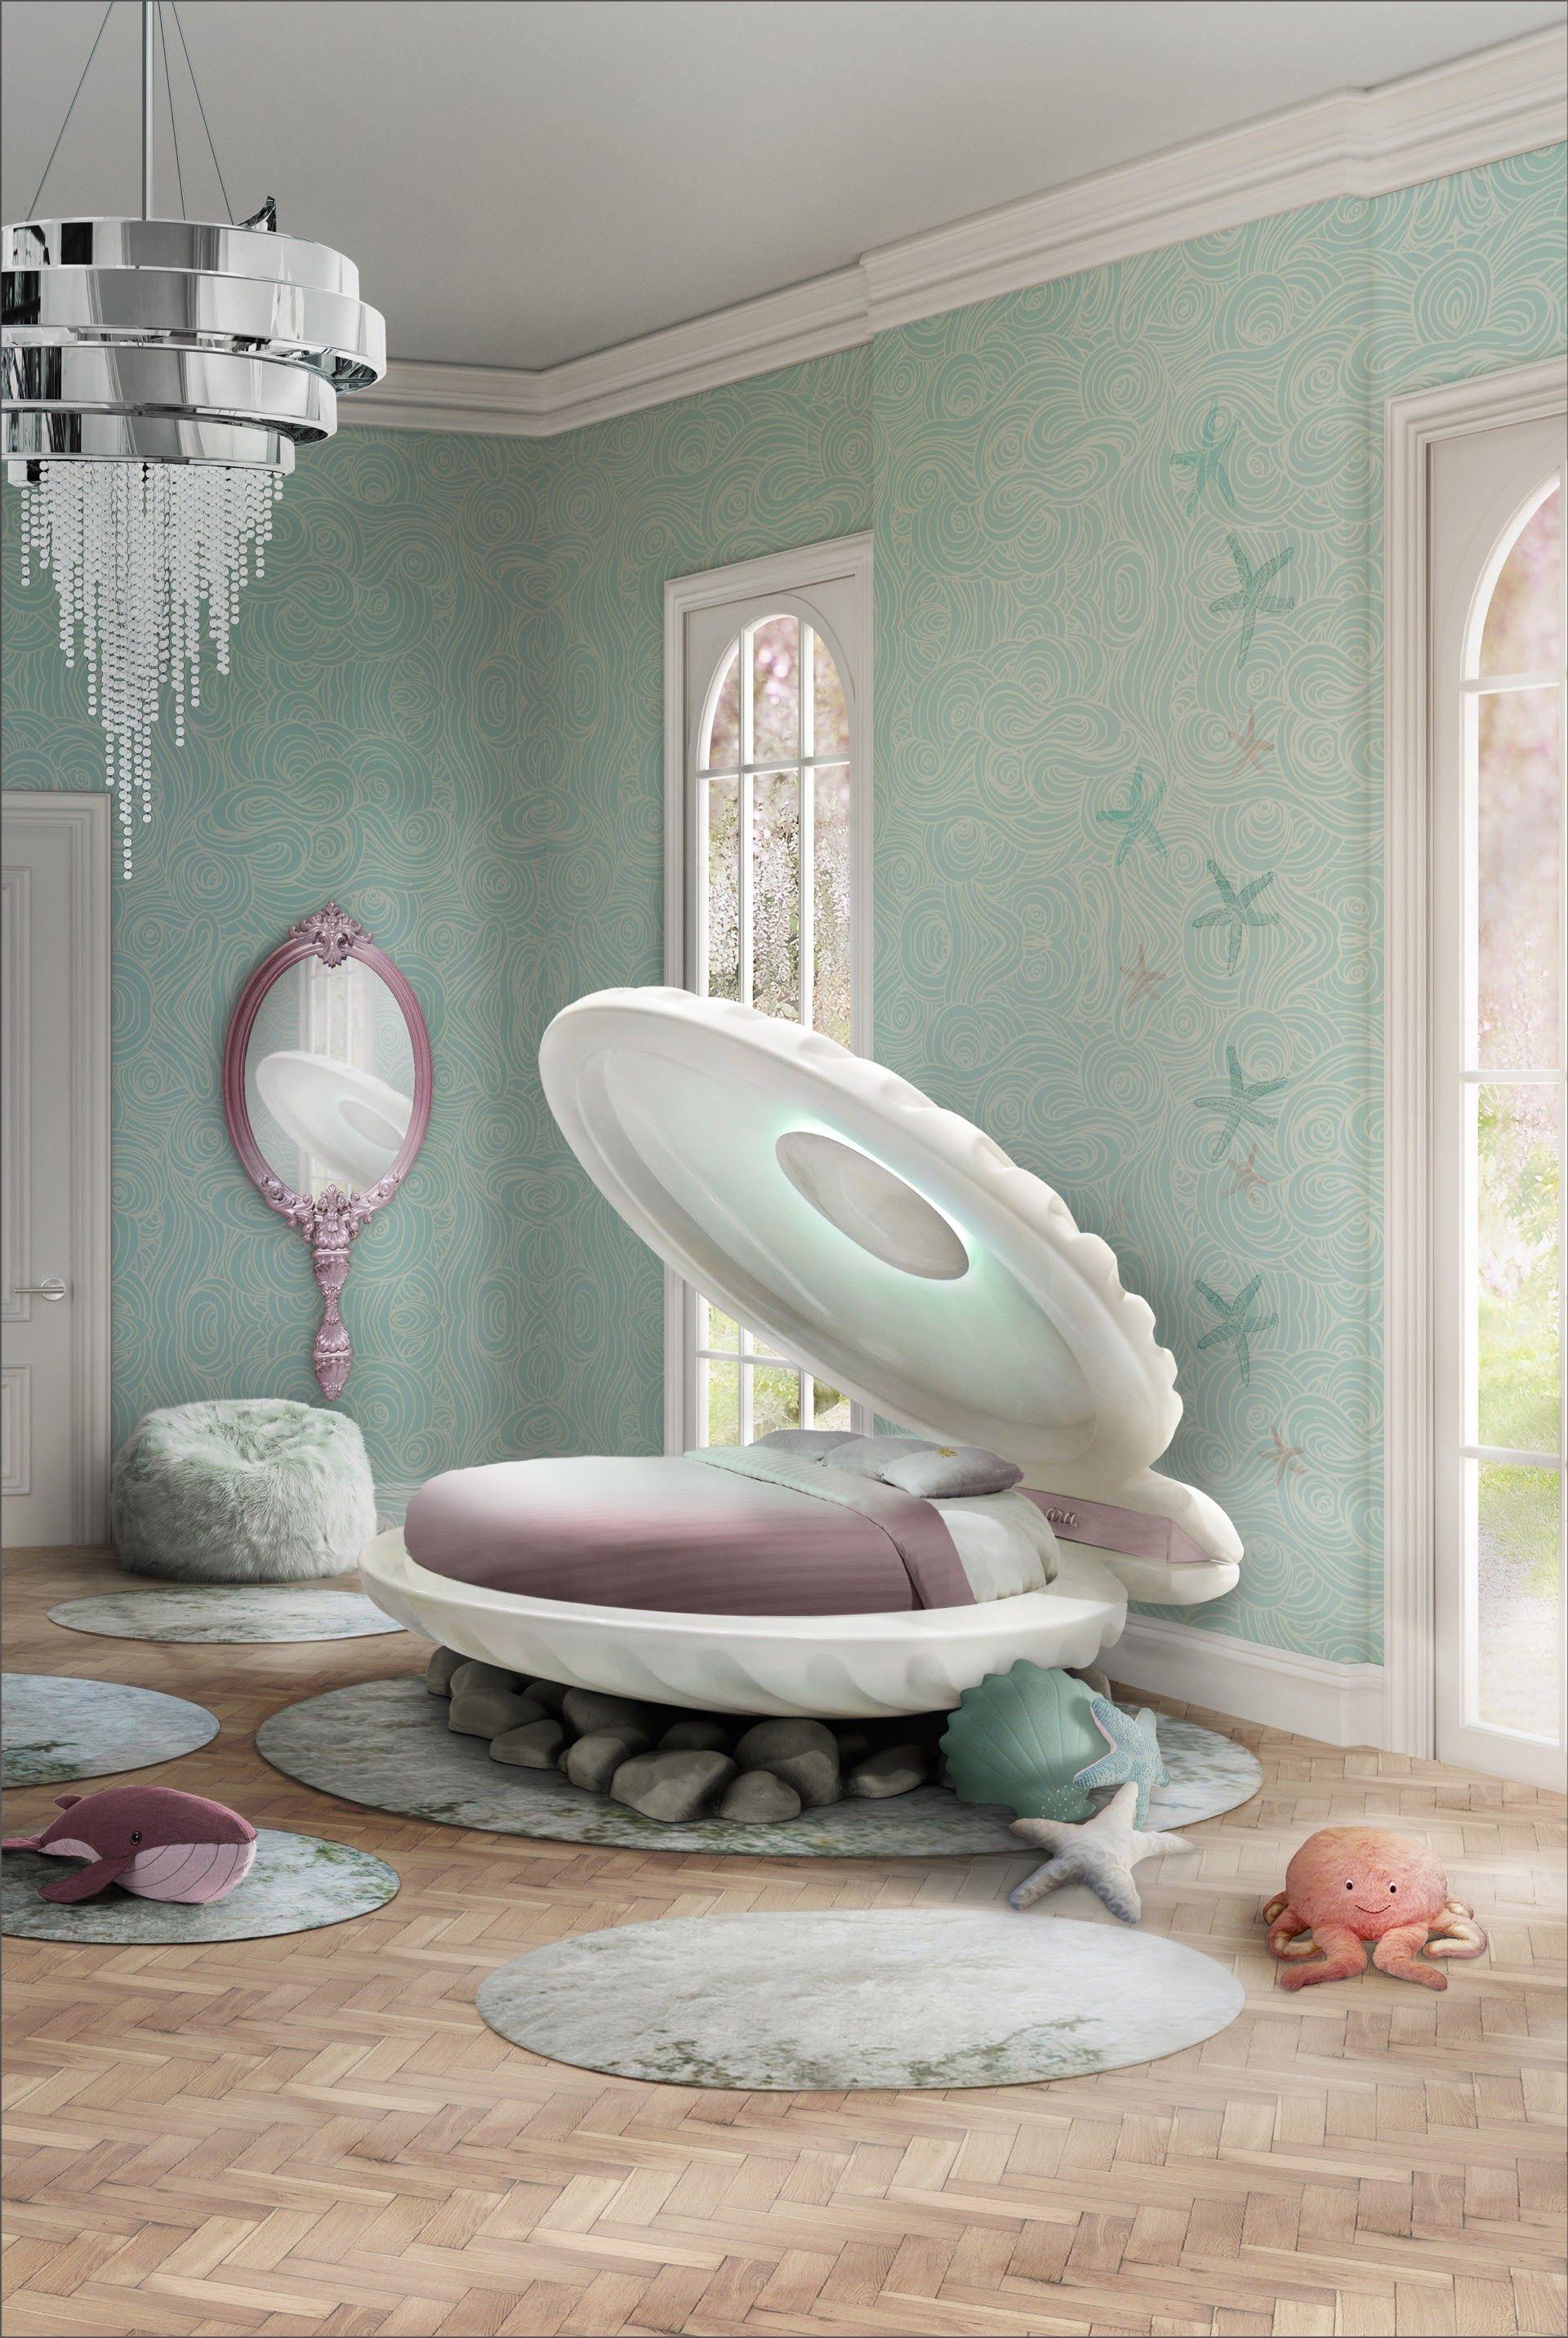 Pin By Little Blue Nest On топ интерьеры и решения Childrens Bedroom Furniture Mermaid Decor Bedroom Little Mermaid Bedroom